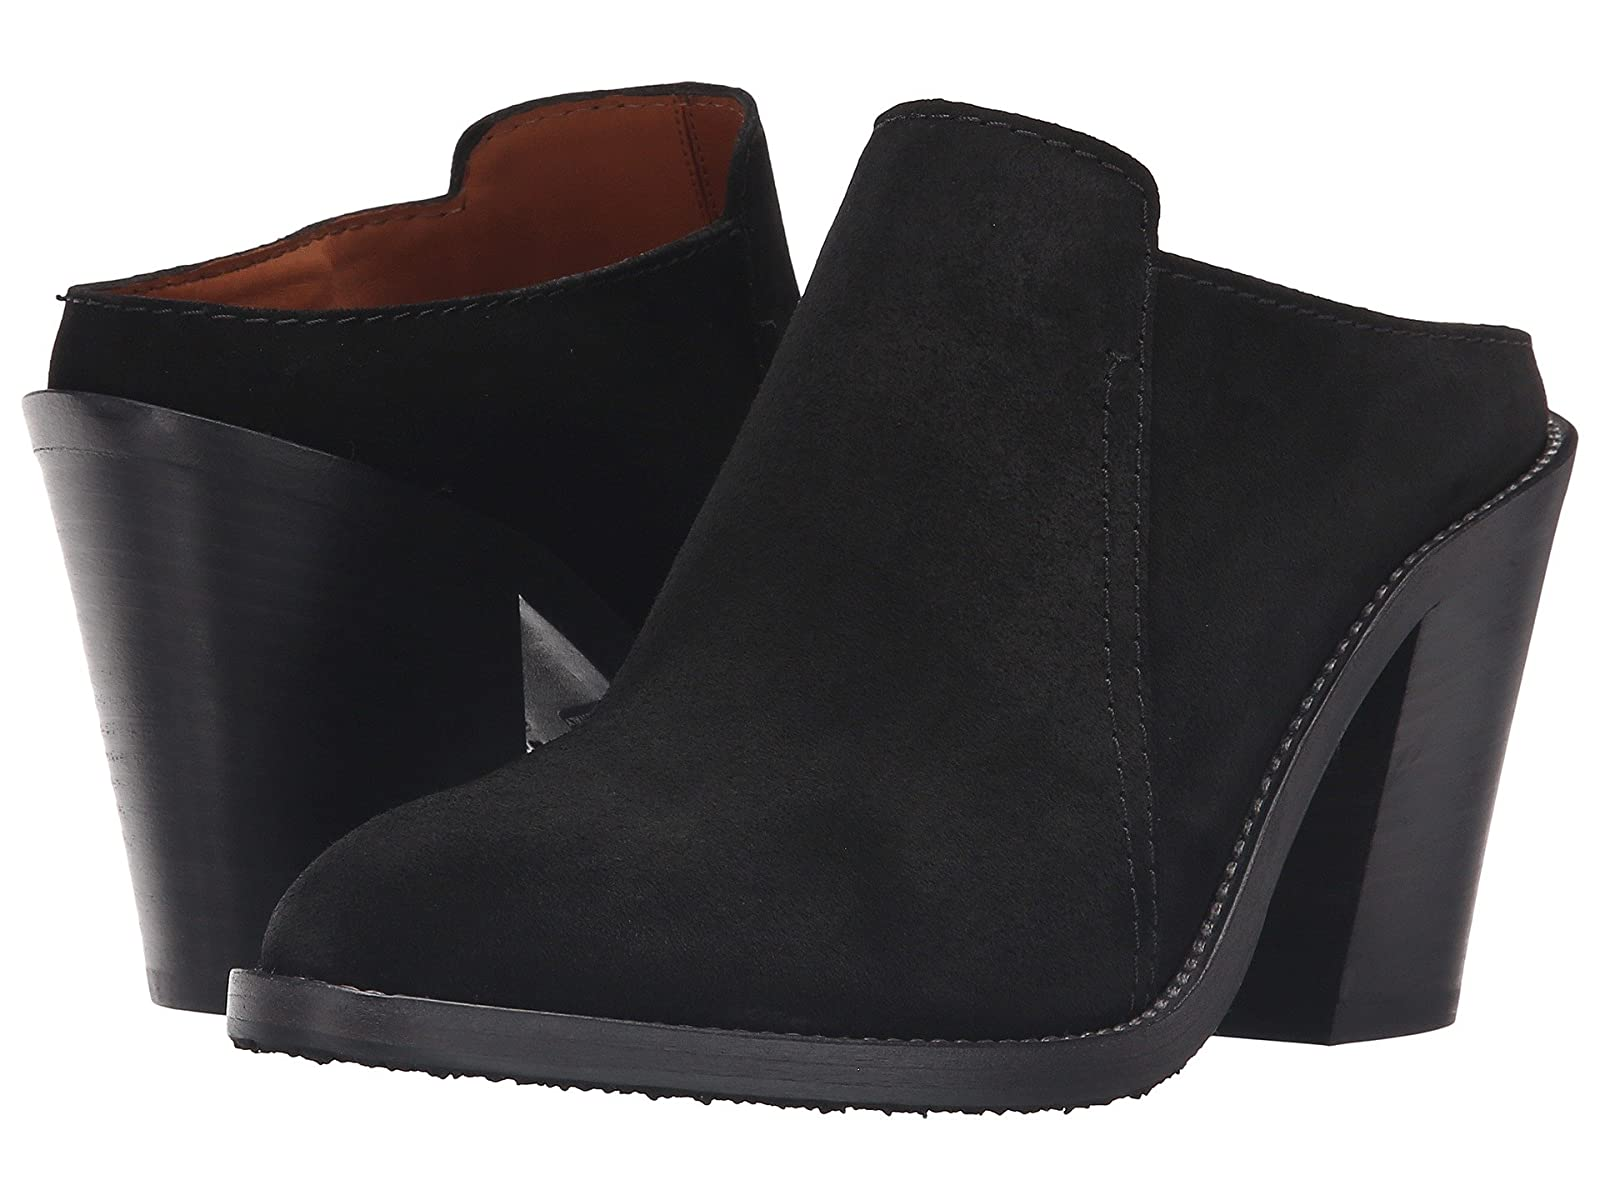 Aquatalia LibbyCheap and distinctive eye-catching shoes